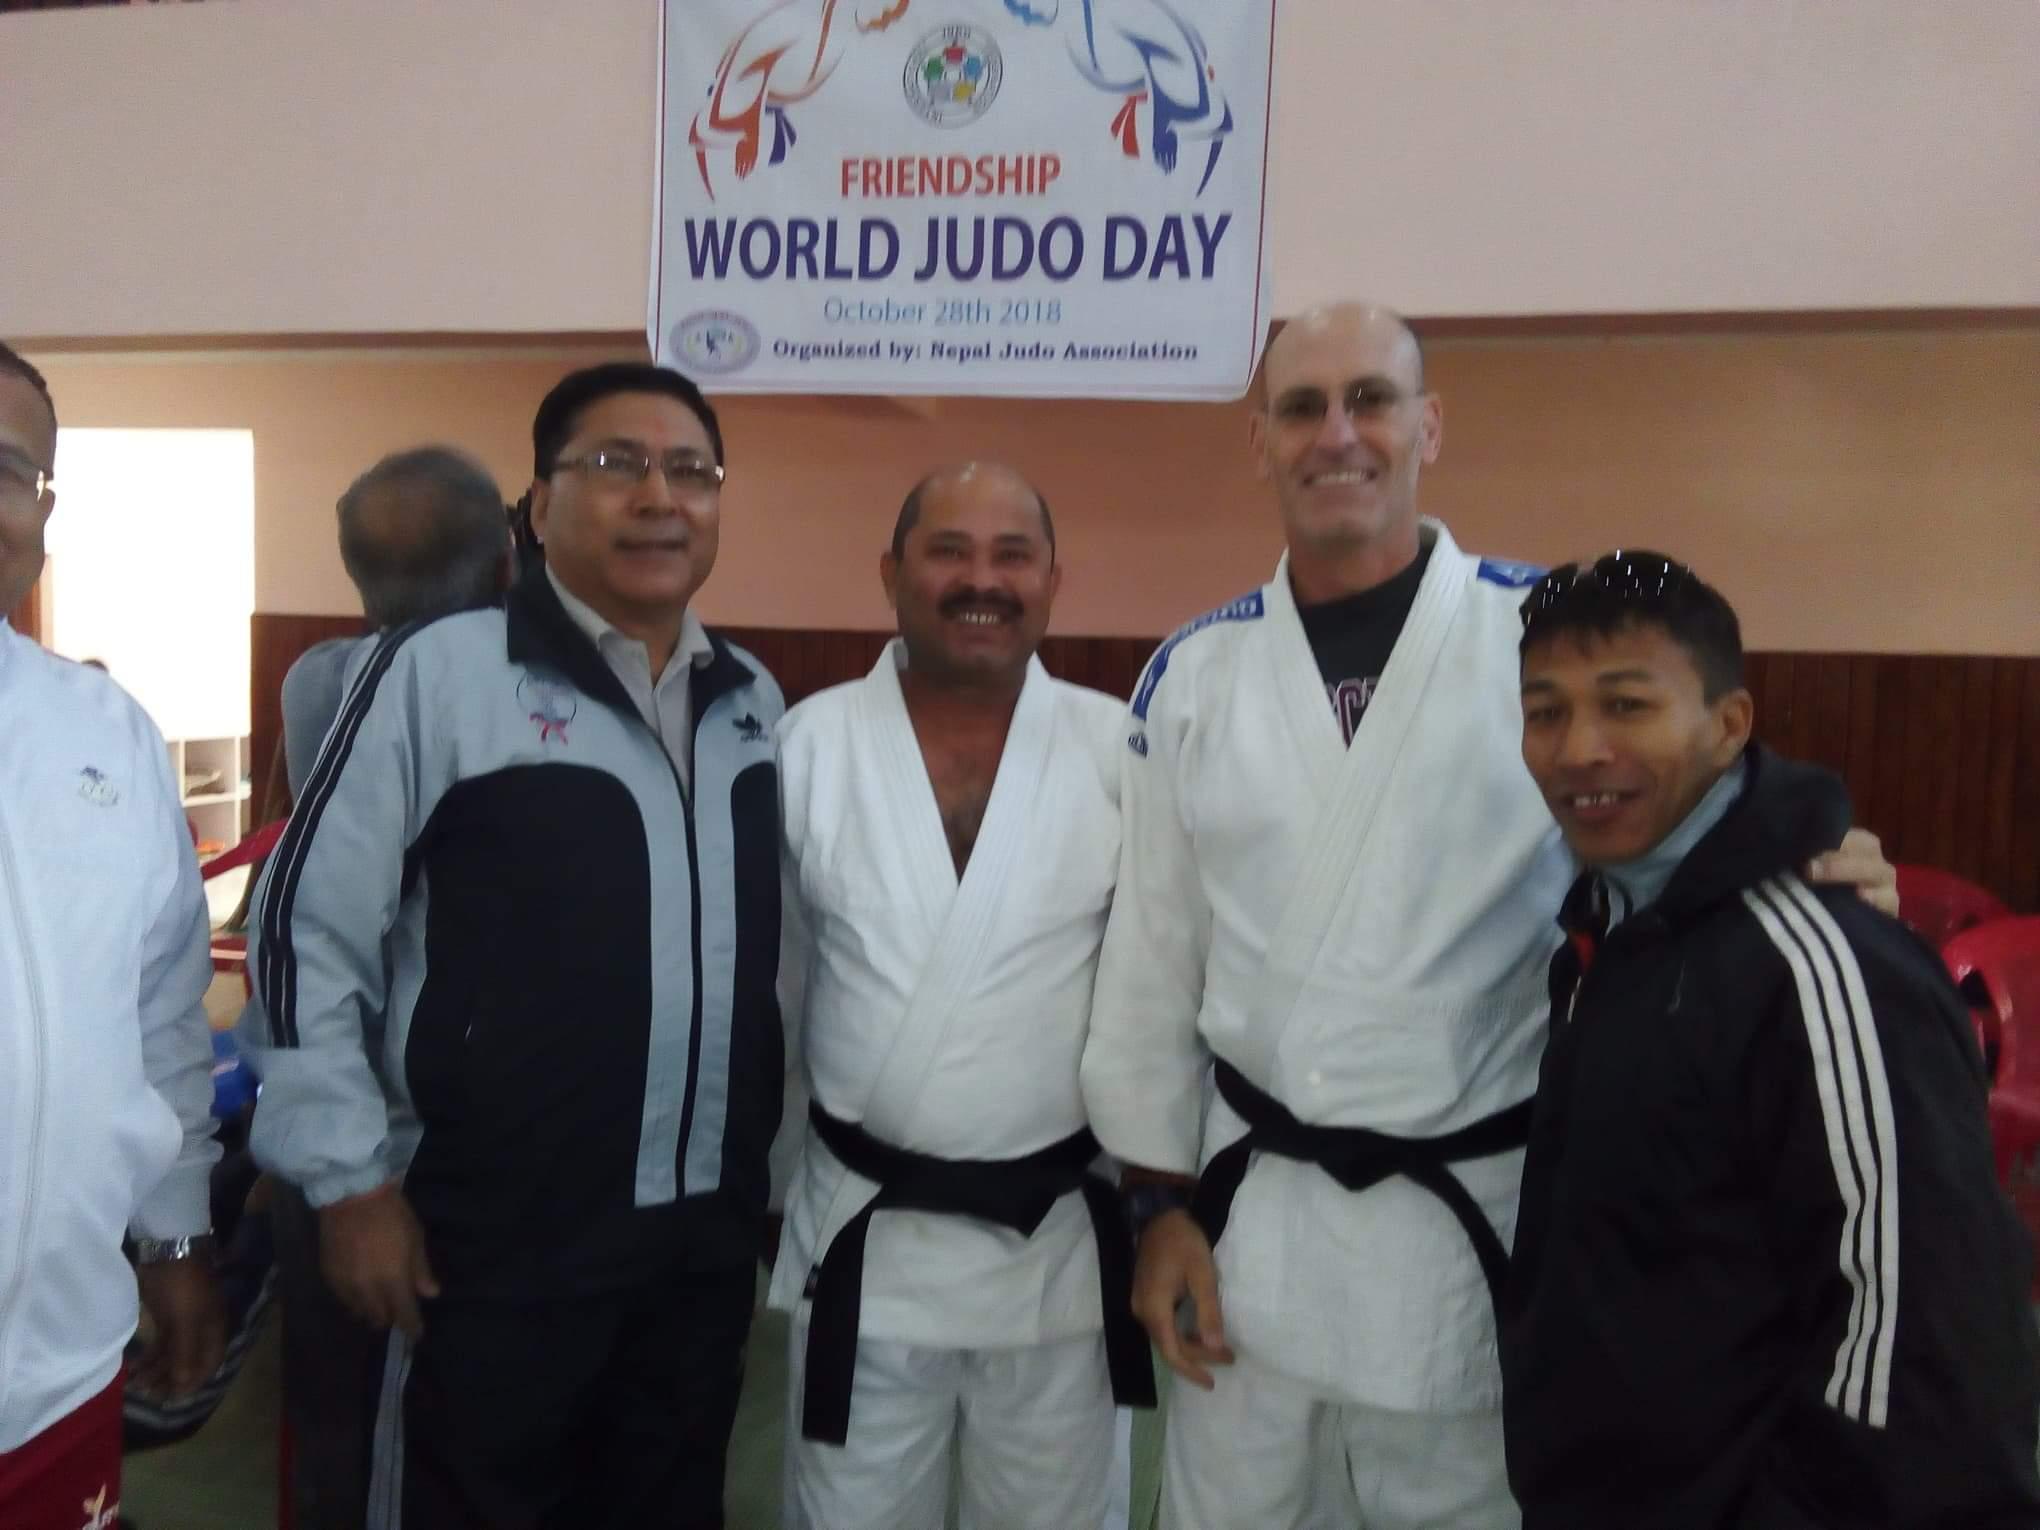 Wayne Lifshitz in Nepal for World Judo Day | Shufu Judo